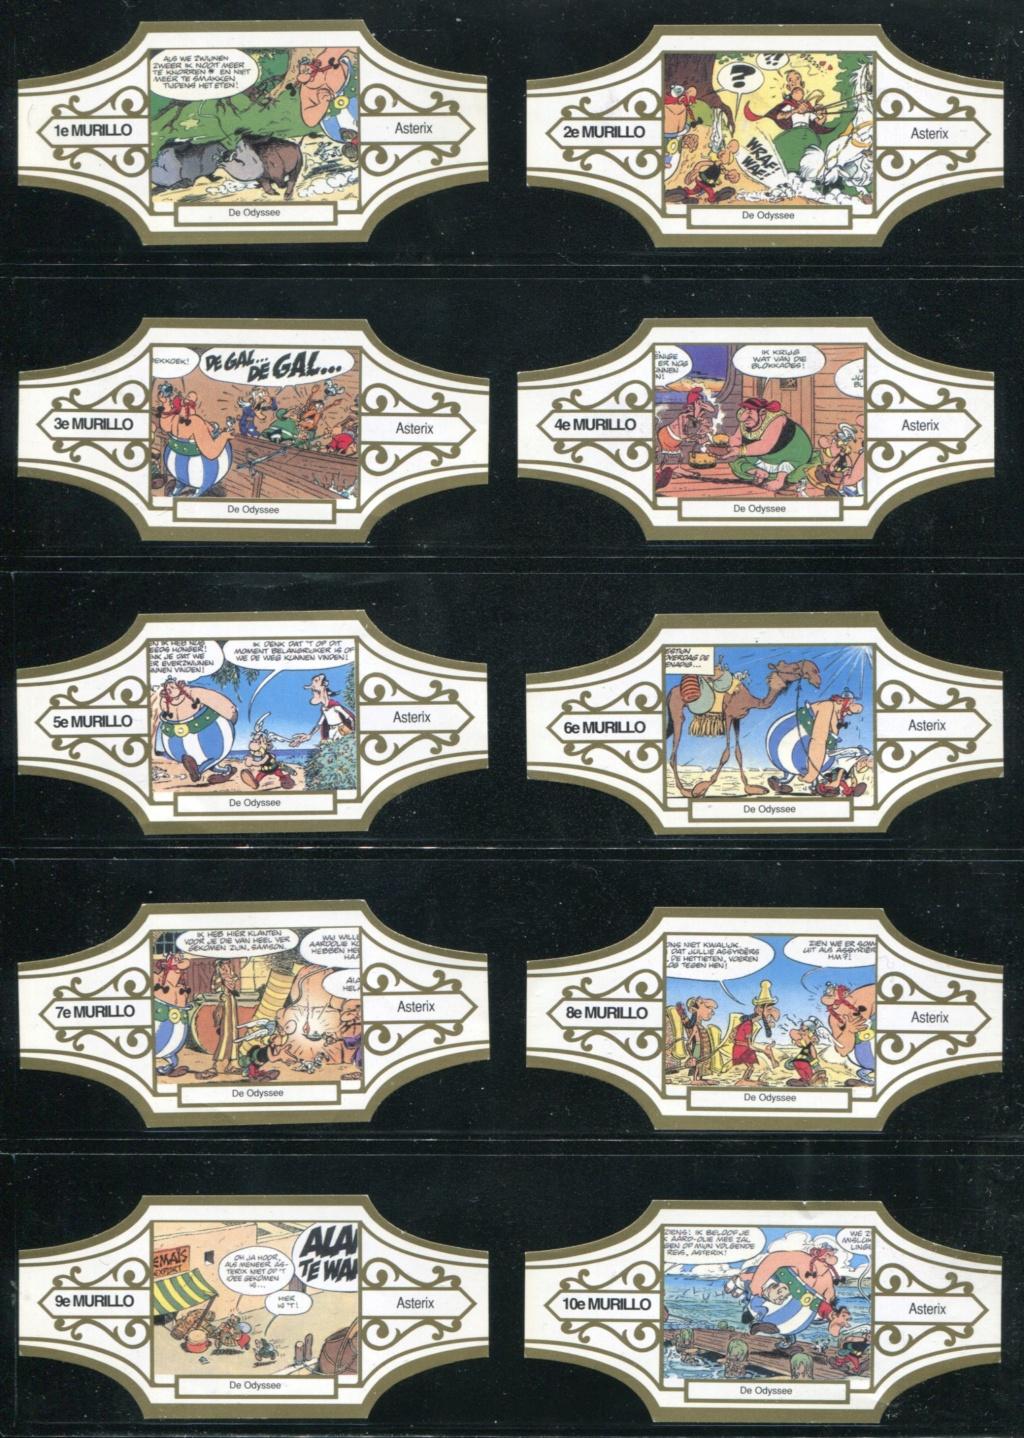 baguescigareGaulois37110  - Page 3 Szori121